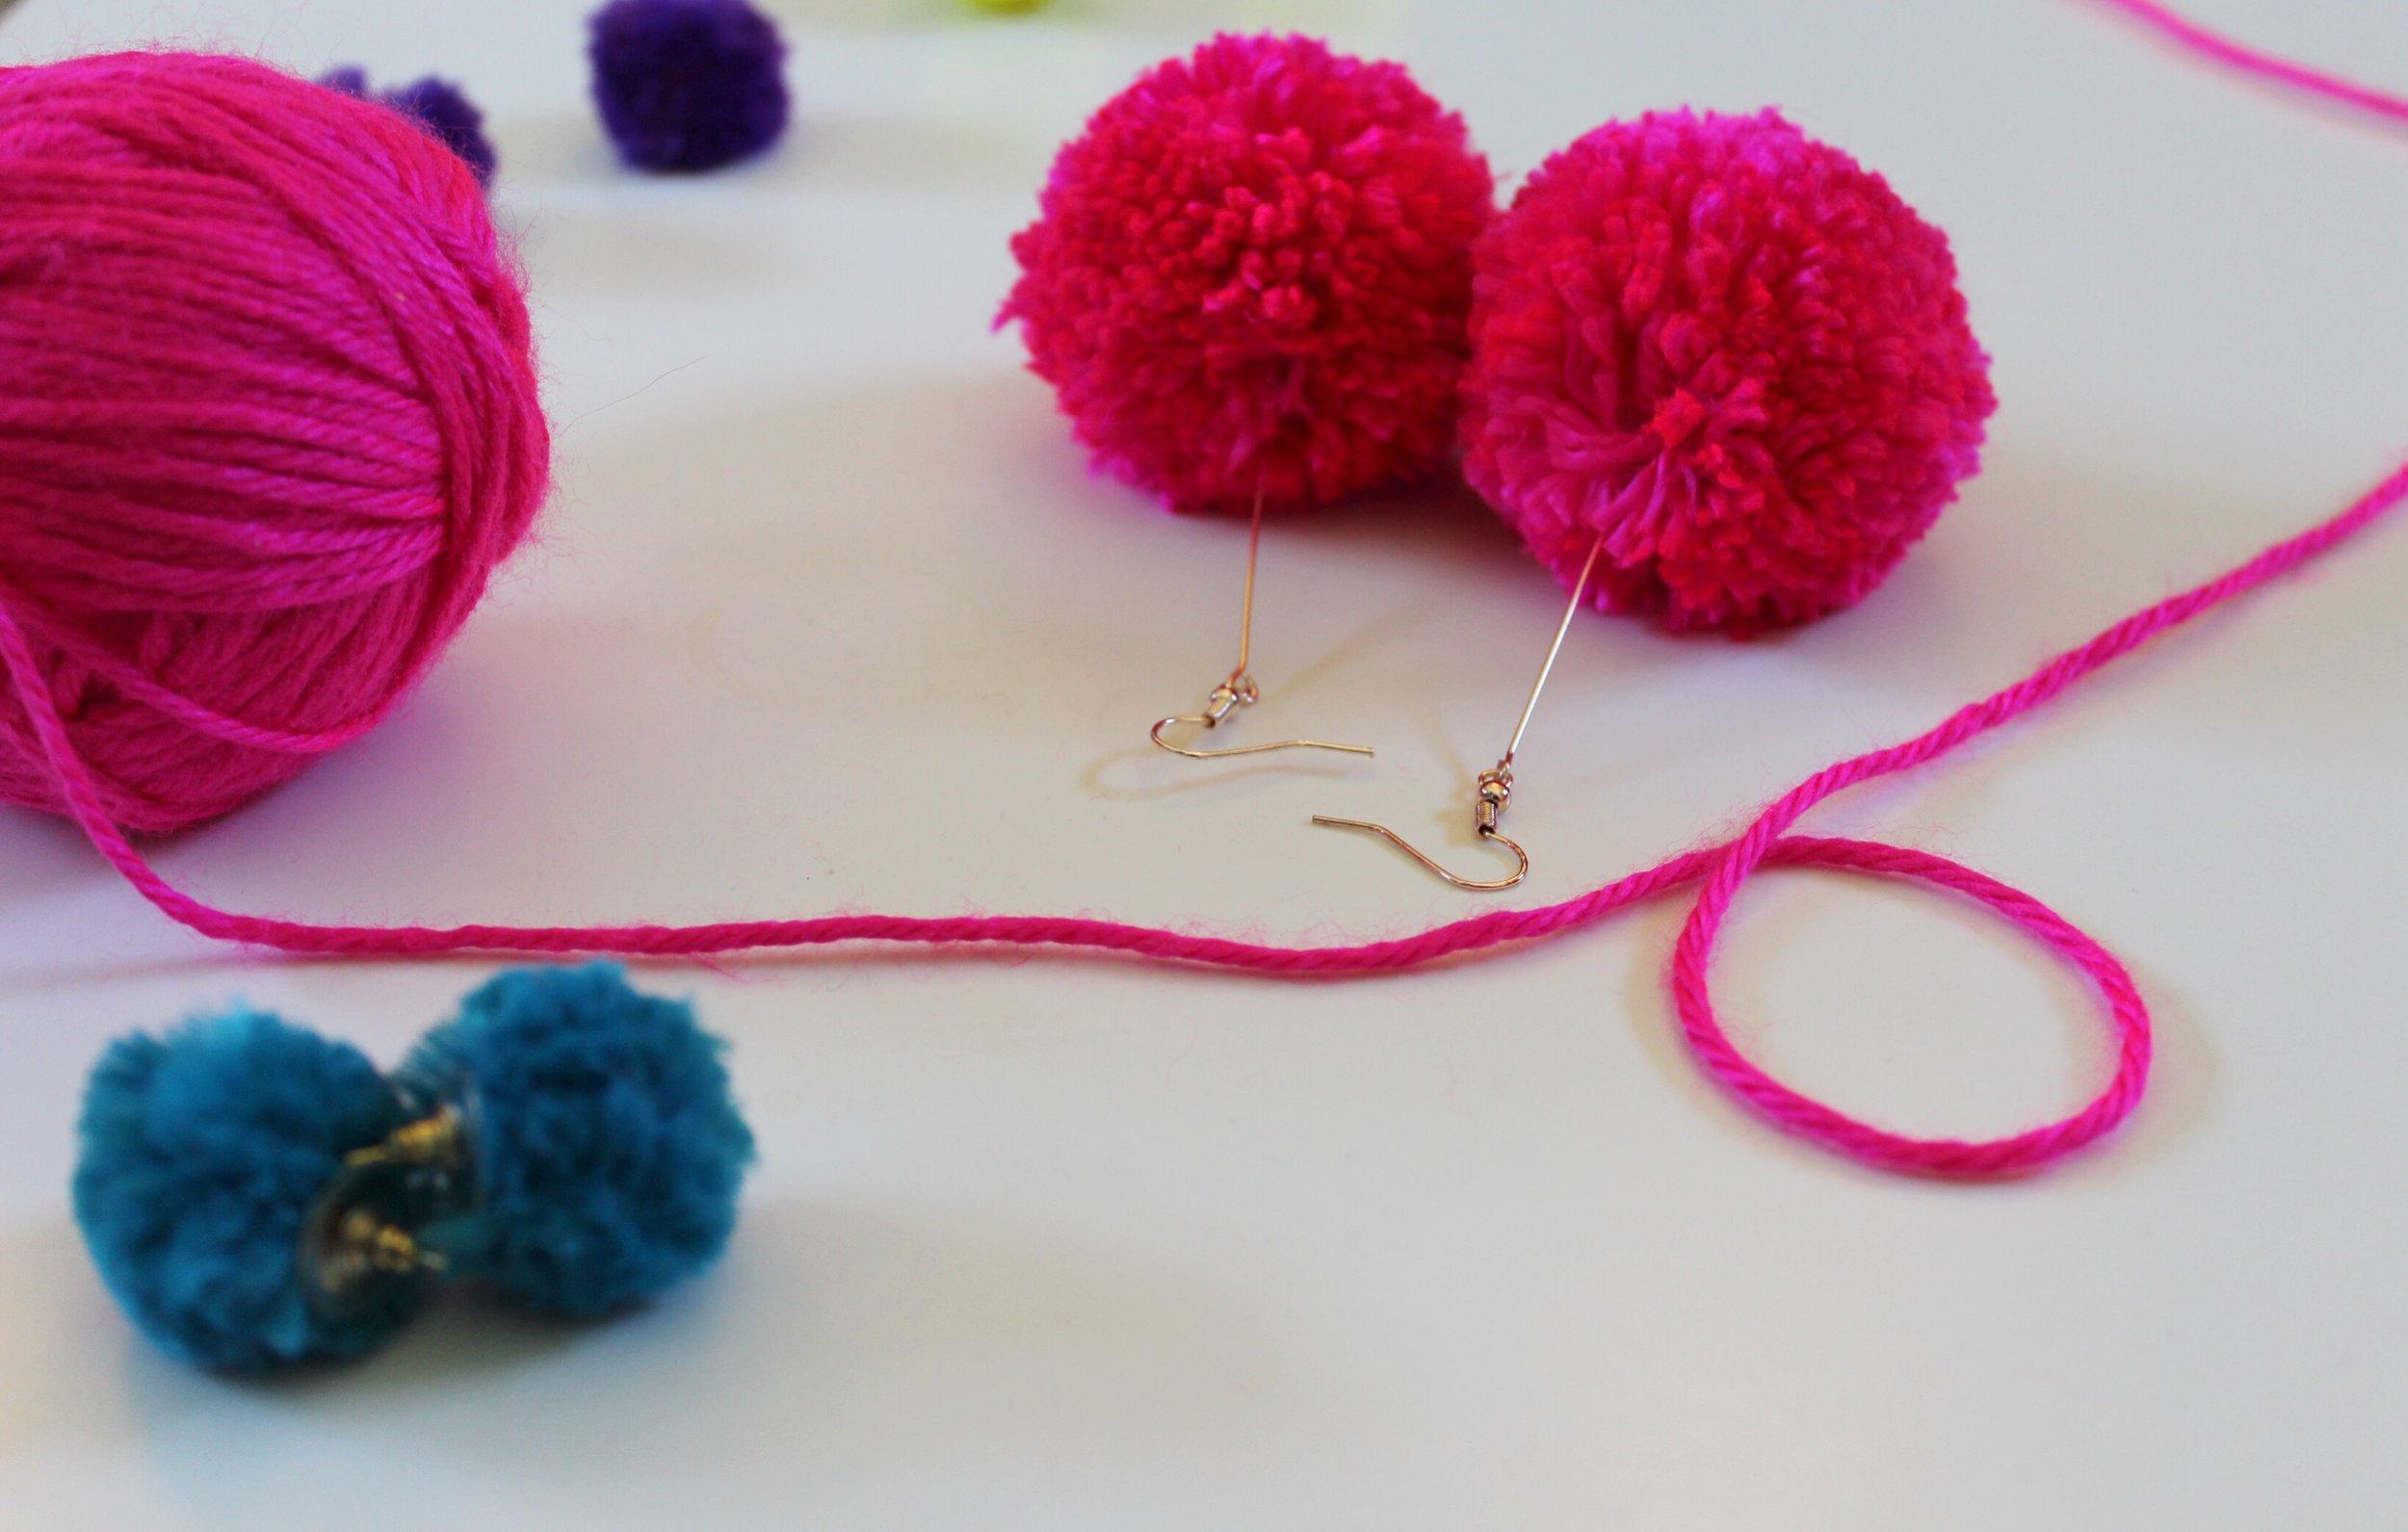 Hot Pink Yarn Ball and Pom Pom Earrings